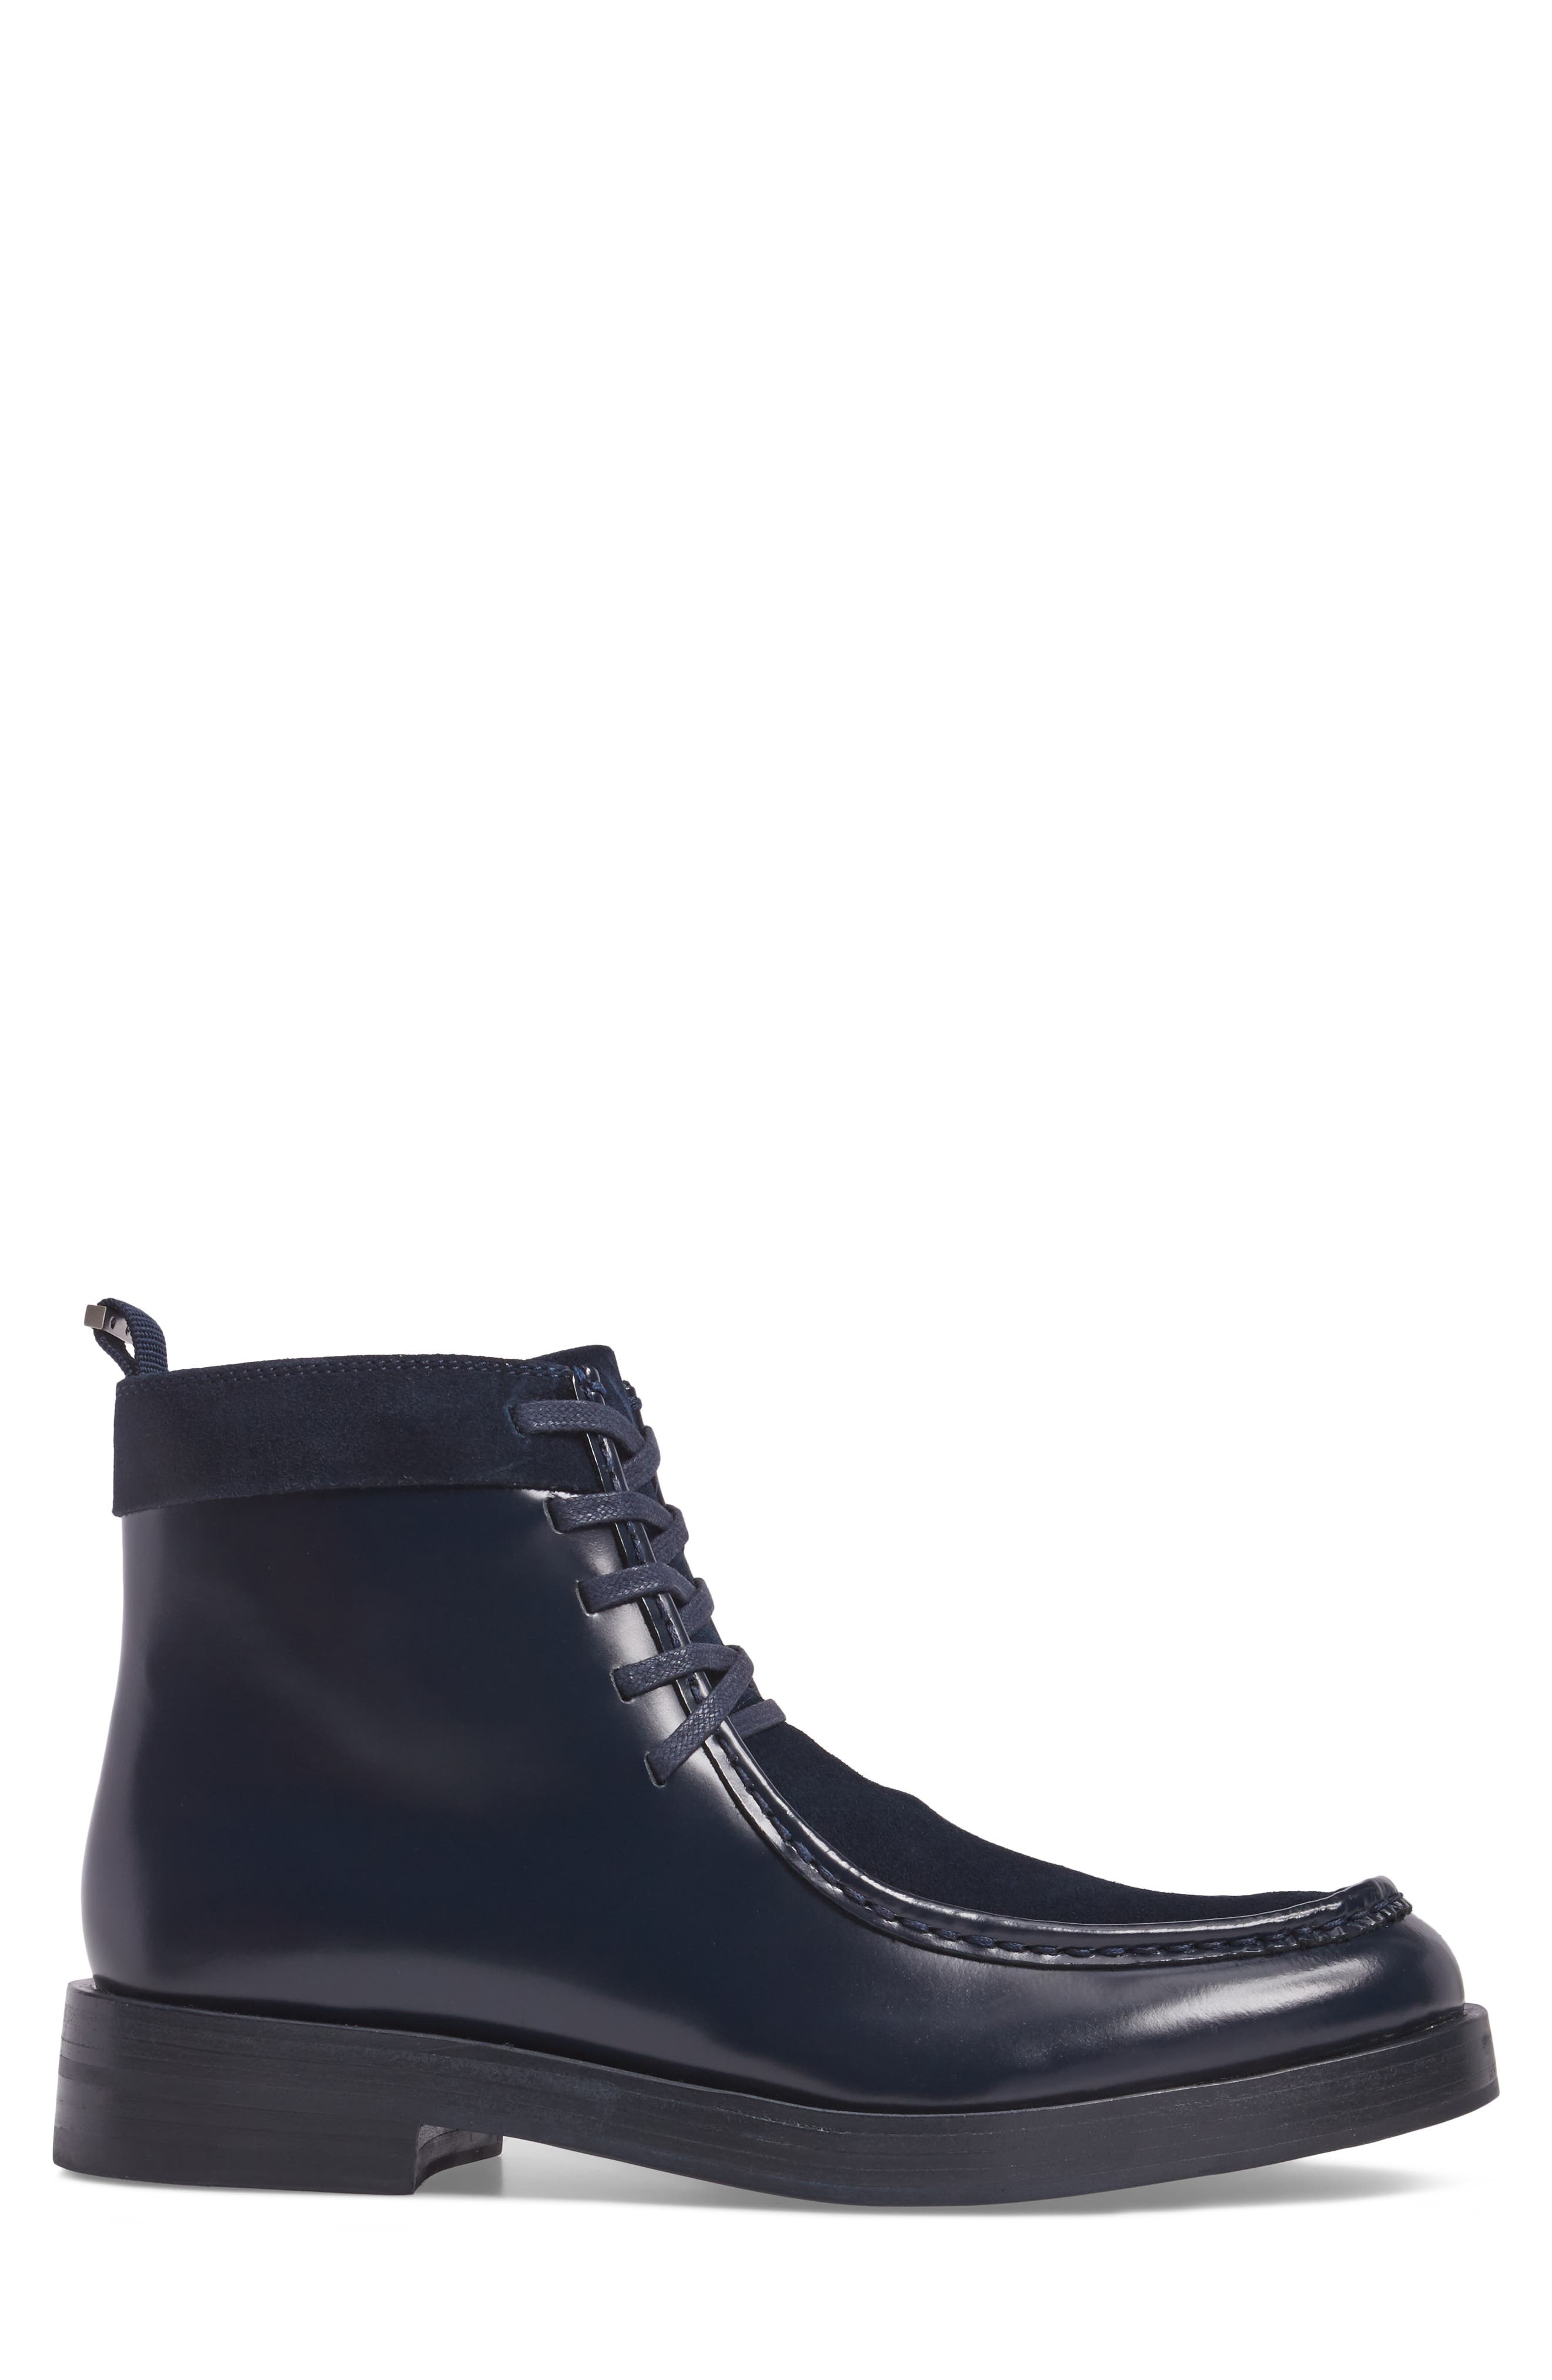 Rafi Moc Toe Boot,                             Alternate thumbnail 3, color,                             Dark Navy Leather